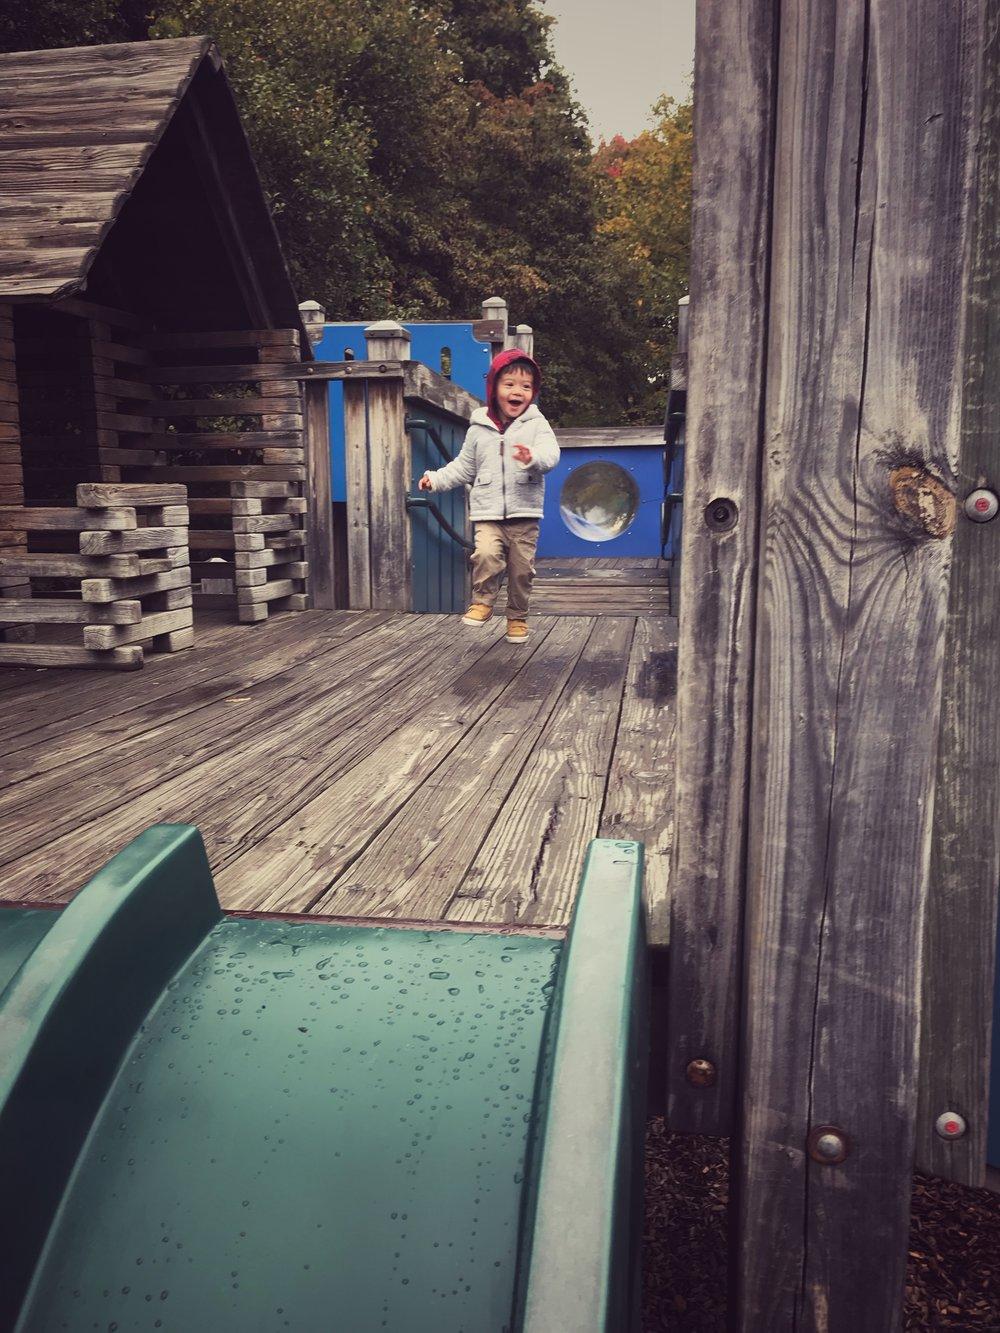 Ben and Jerry's Playground Vermont